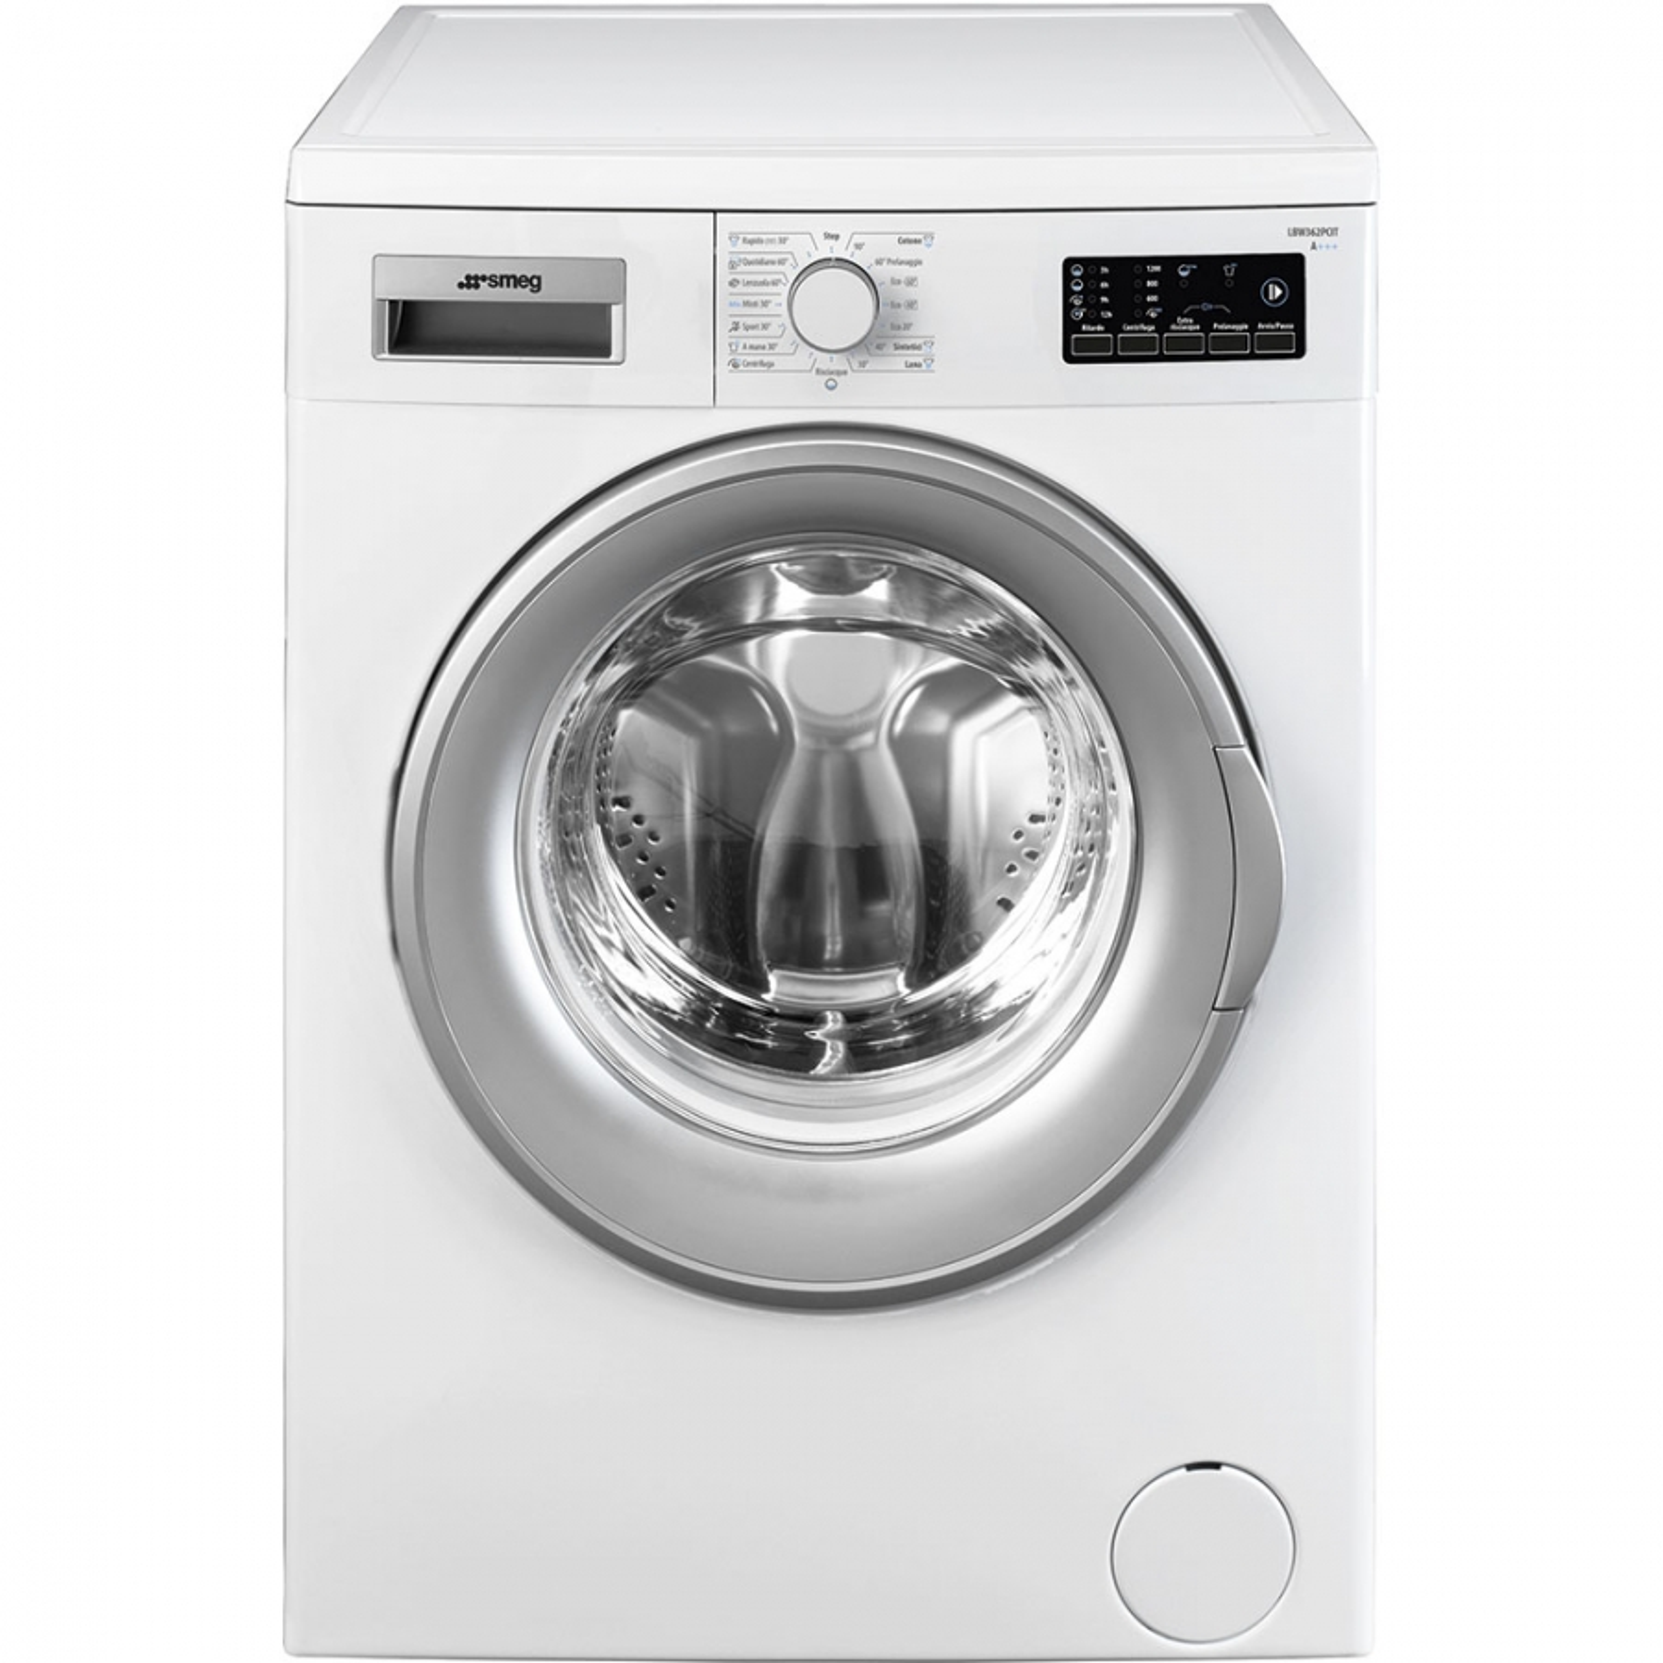 lavatrice smeg lbw362pcit slim 40 cm 6 kg 1200 giri classe